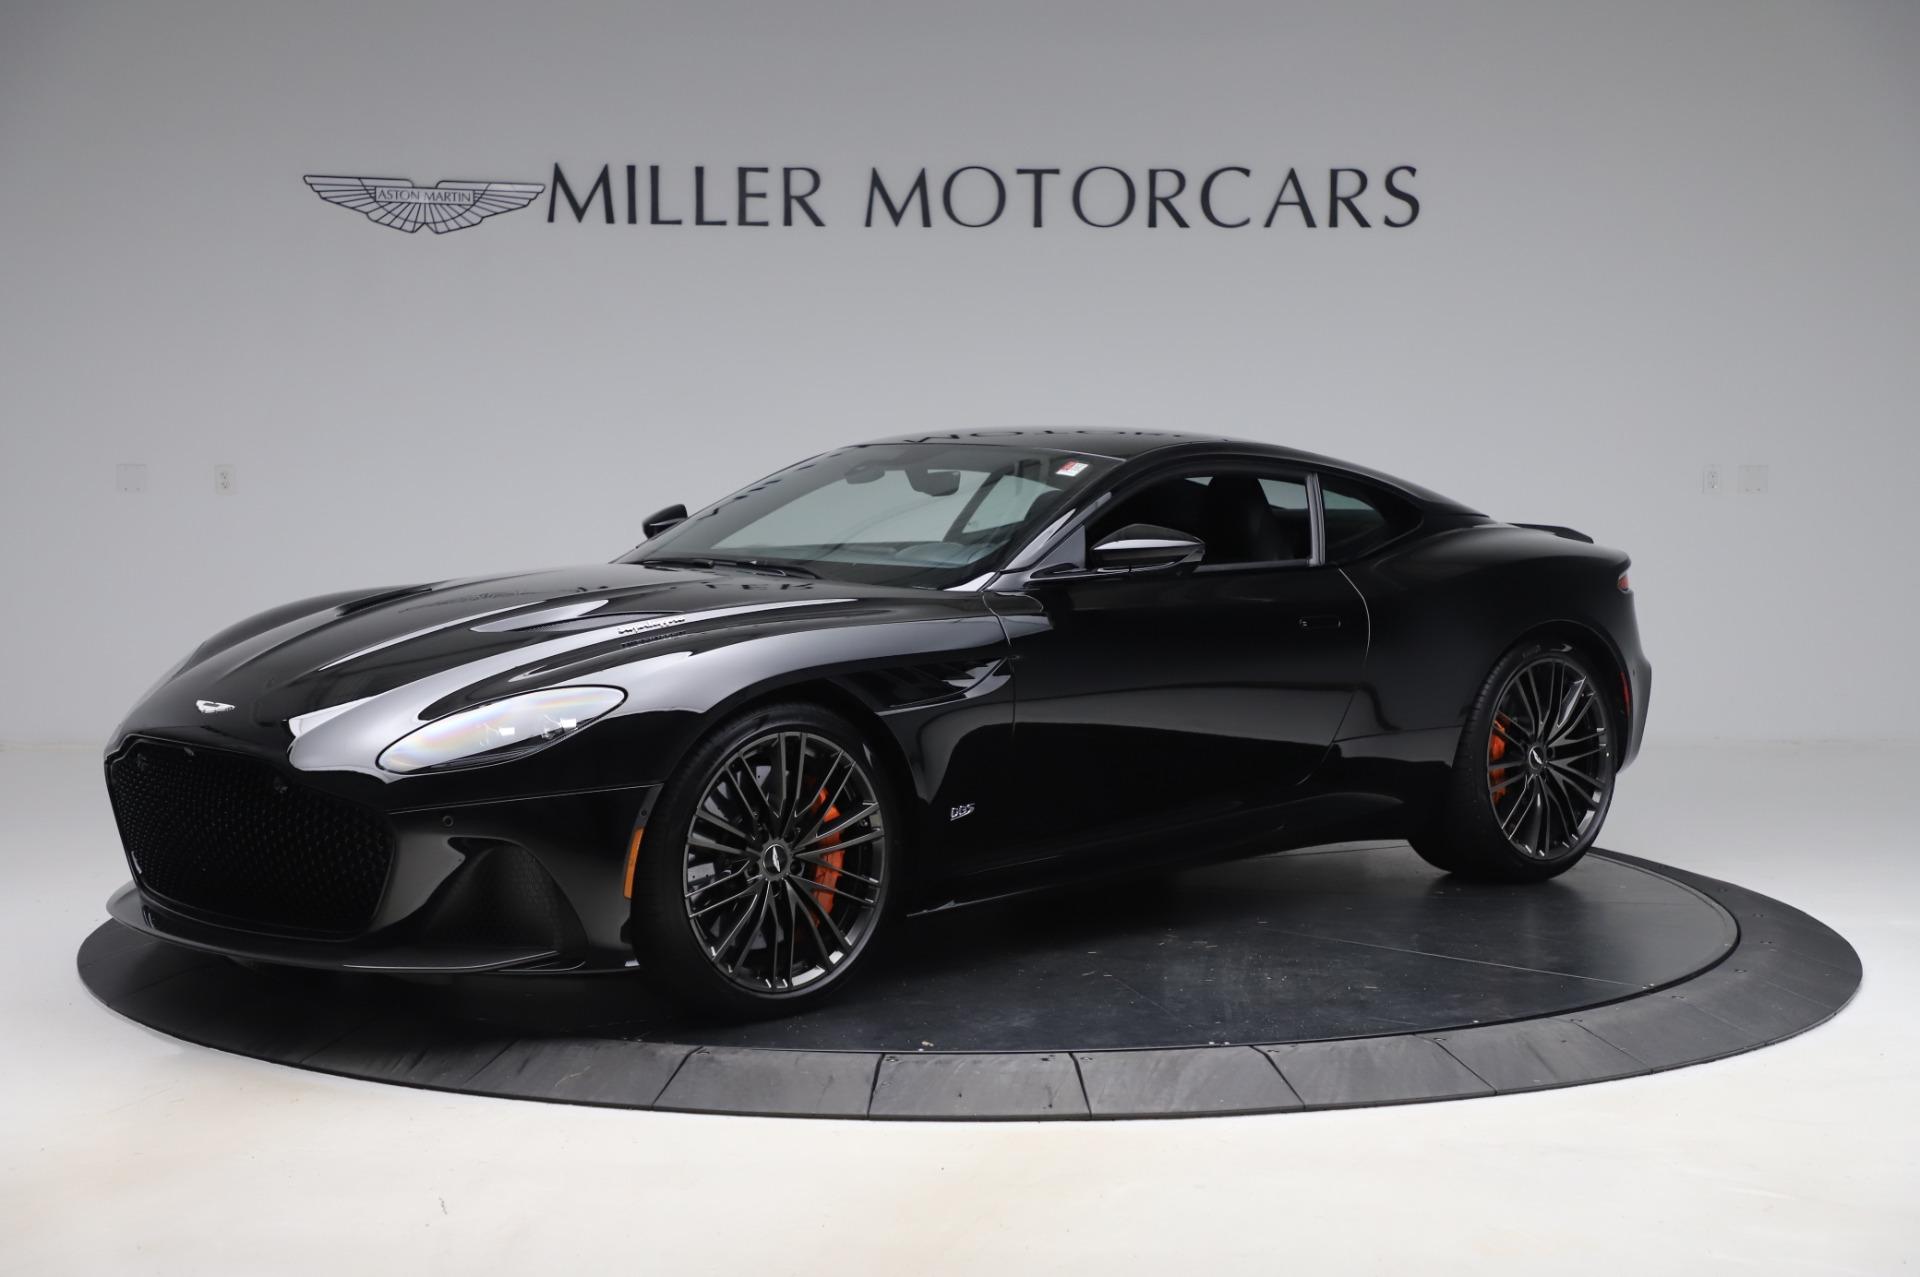 New 2020 Aston Martin DBS Superleggera for sale $328,786 at Bugatti of Greenwich in Greenwich CT 06830 1